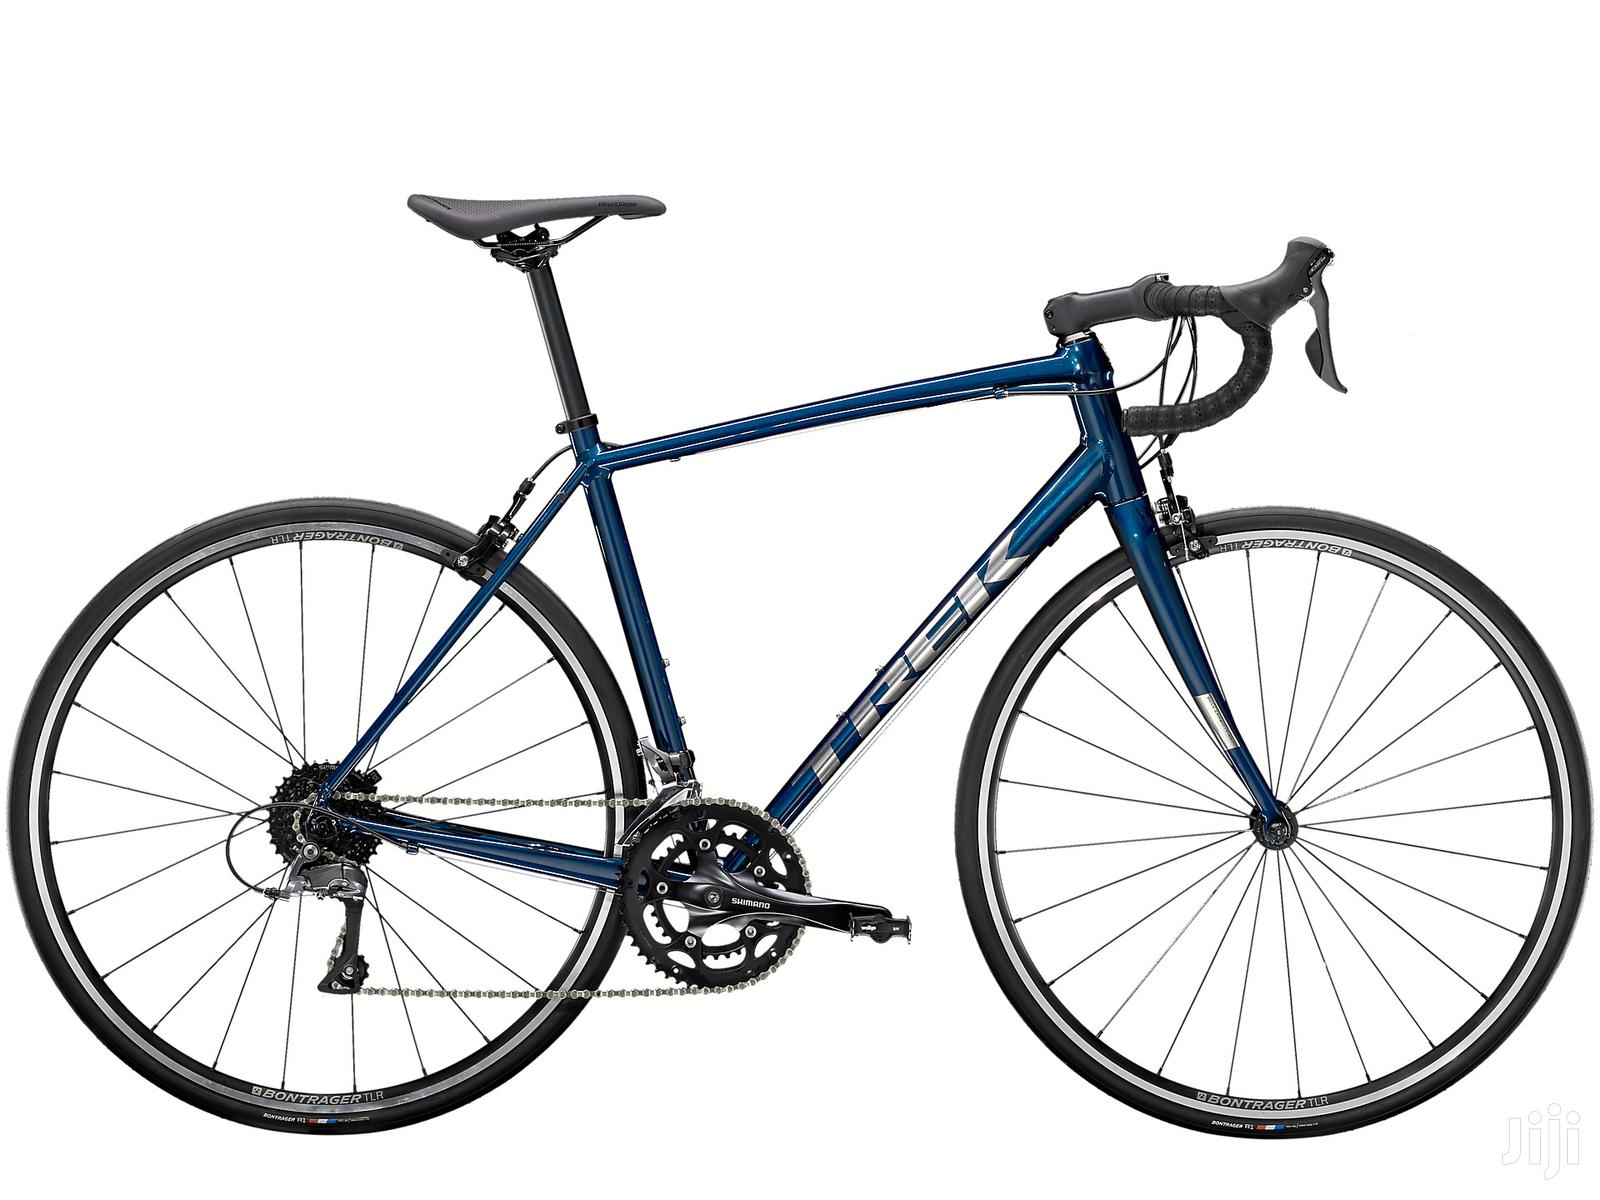 Trek Domane AL 2 Disc Unisex Sportive Road Bike 2021 62CM